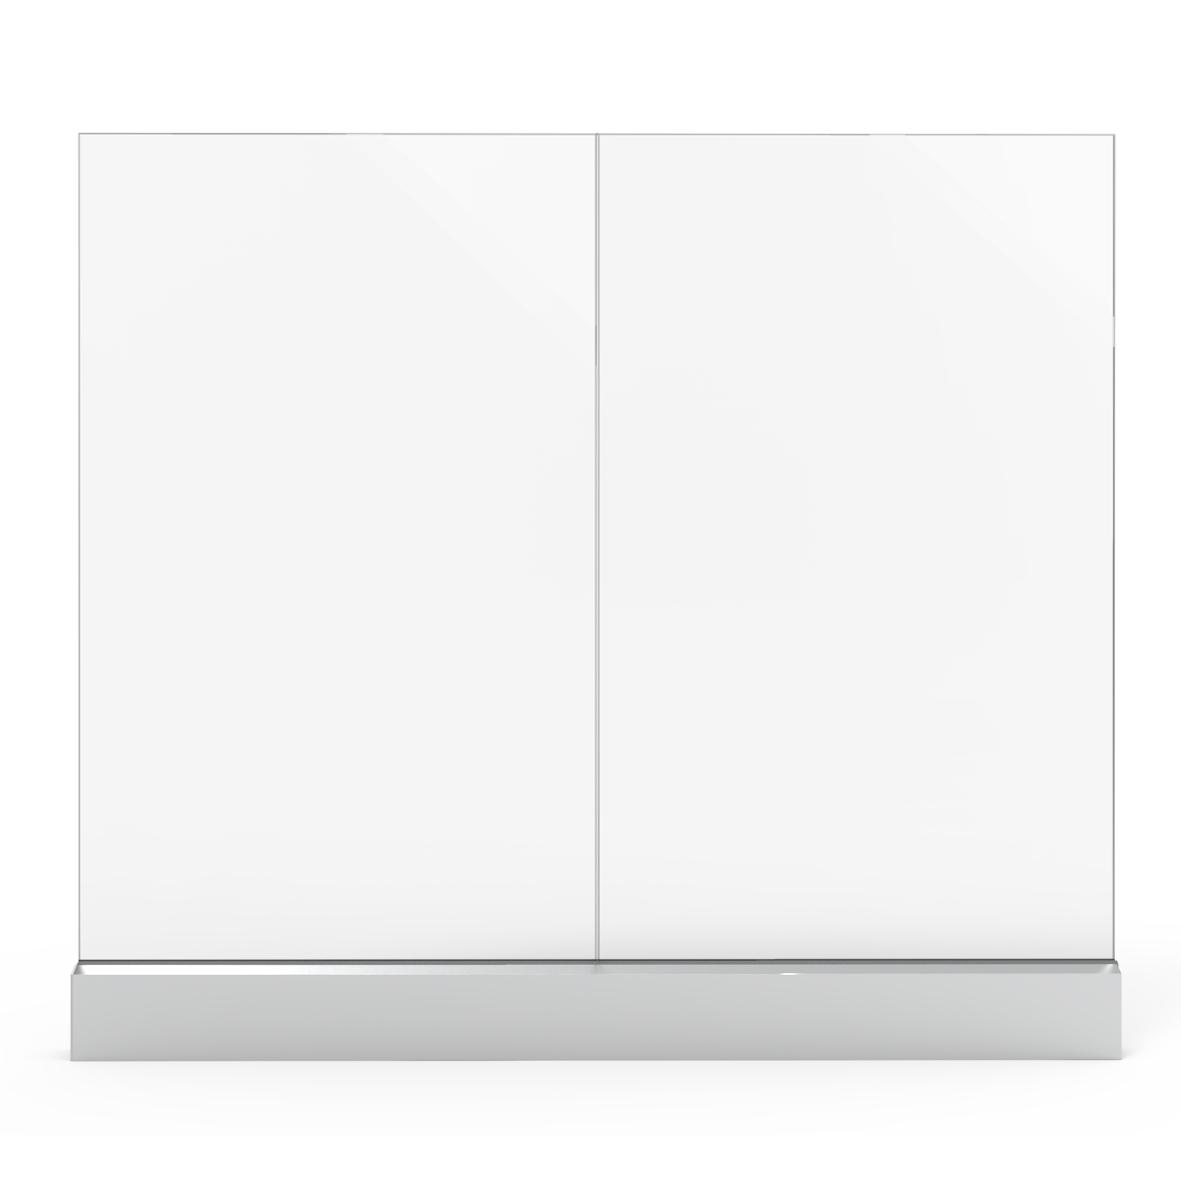 https://www.allpaint.it/wp-content/uploads/2021/07/ringhiere-alluminio-tg300-allpaint.jpg